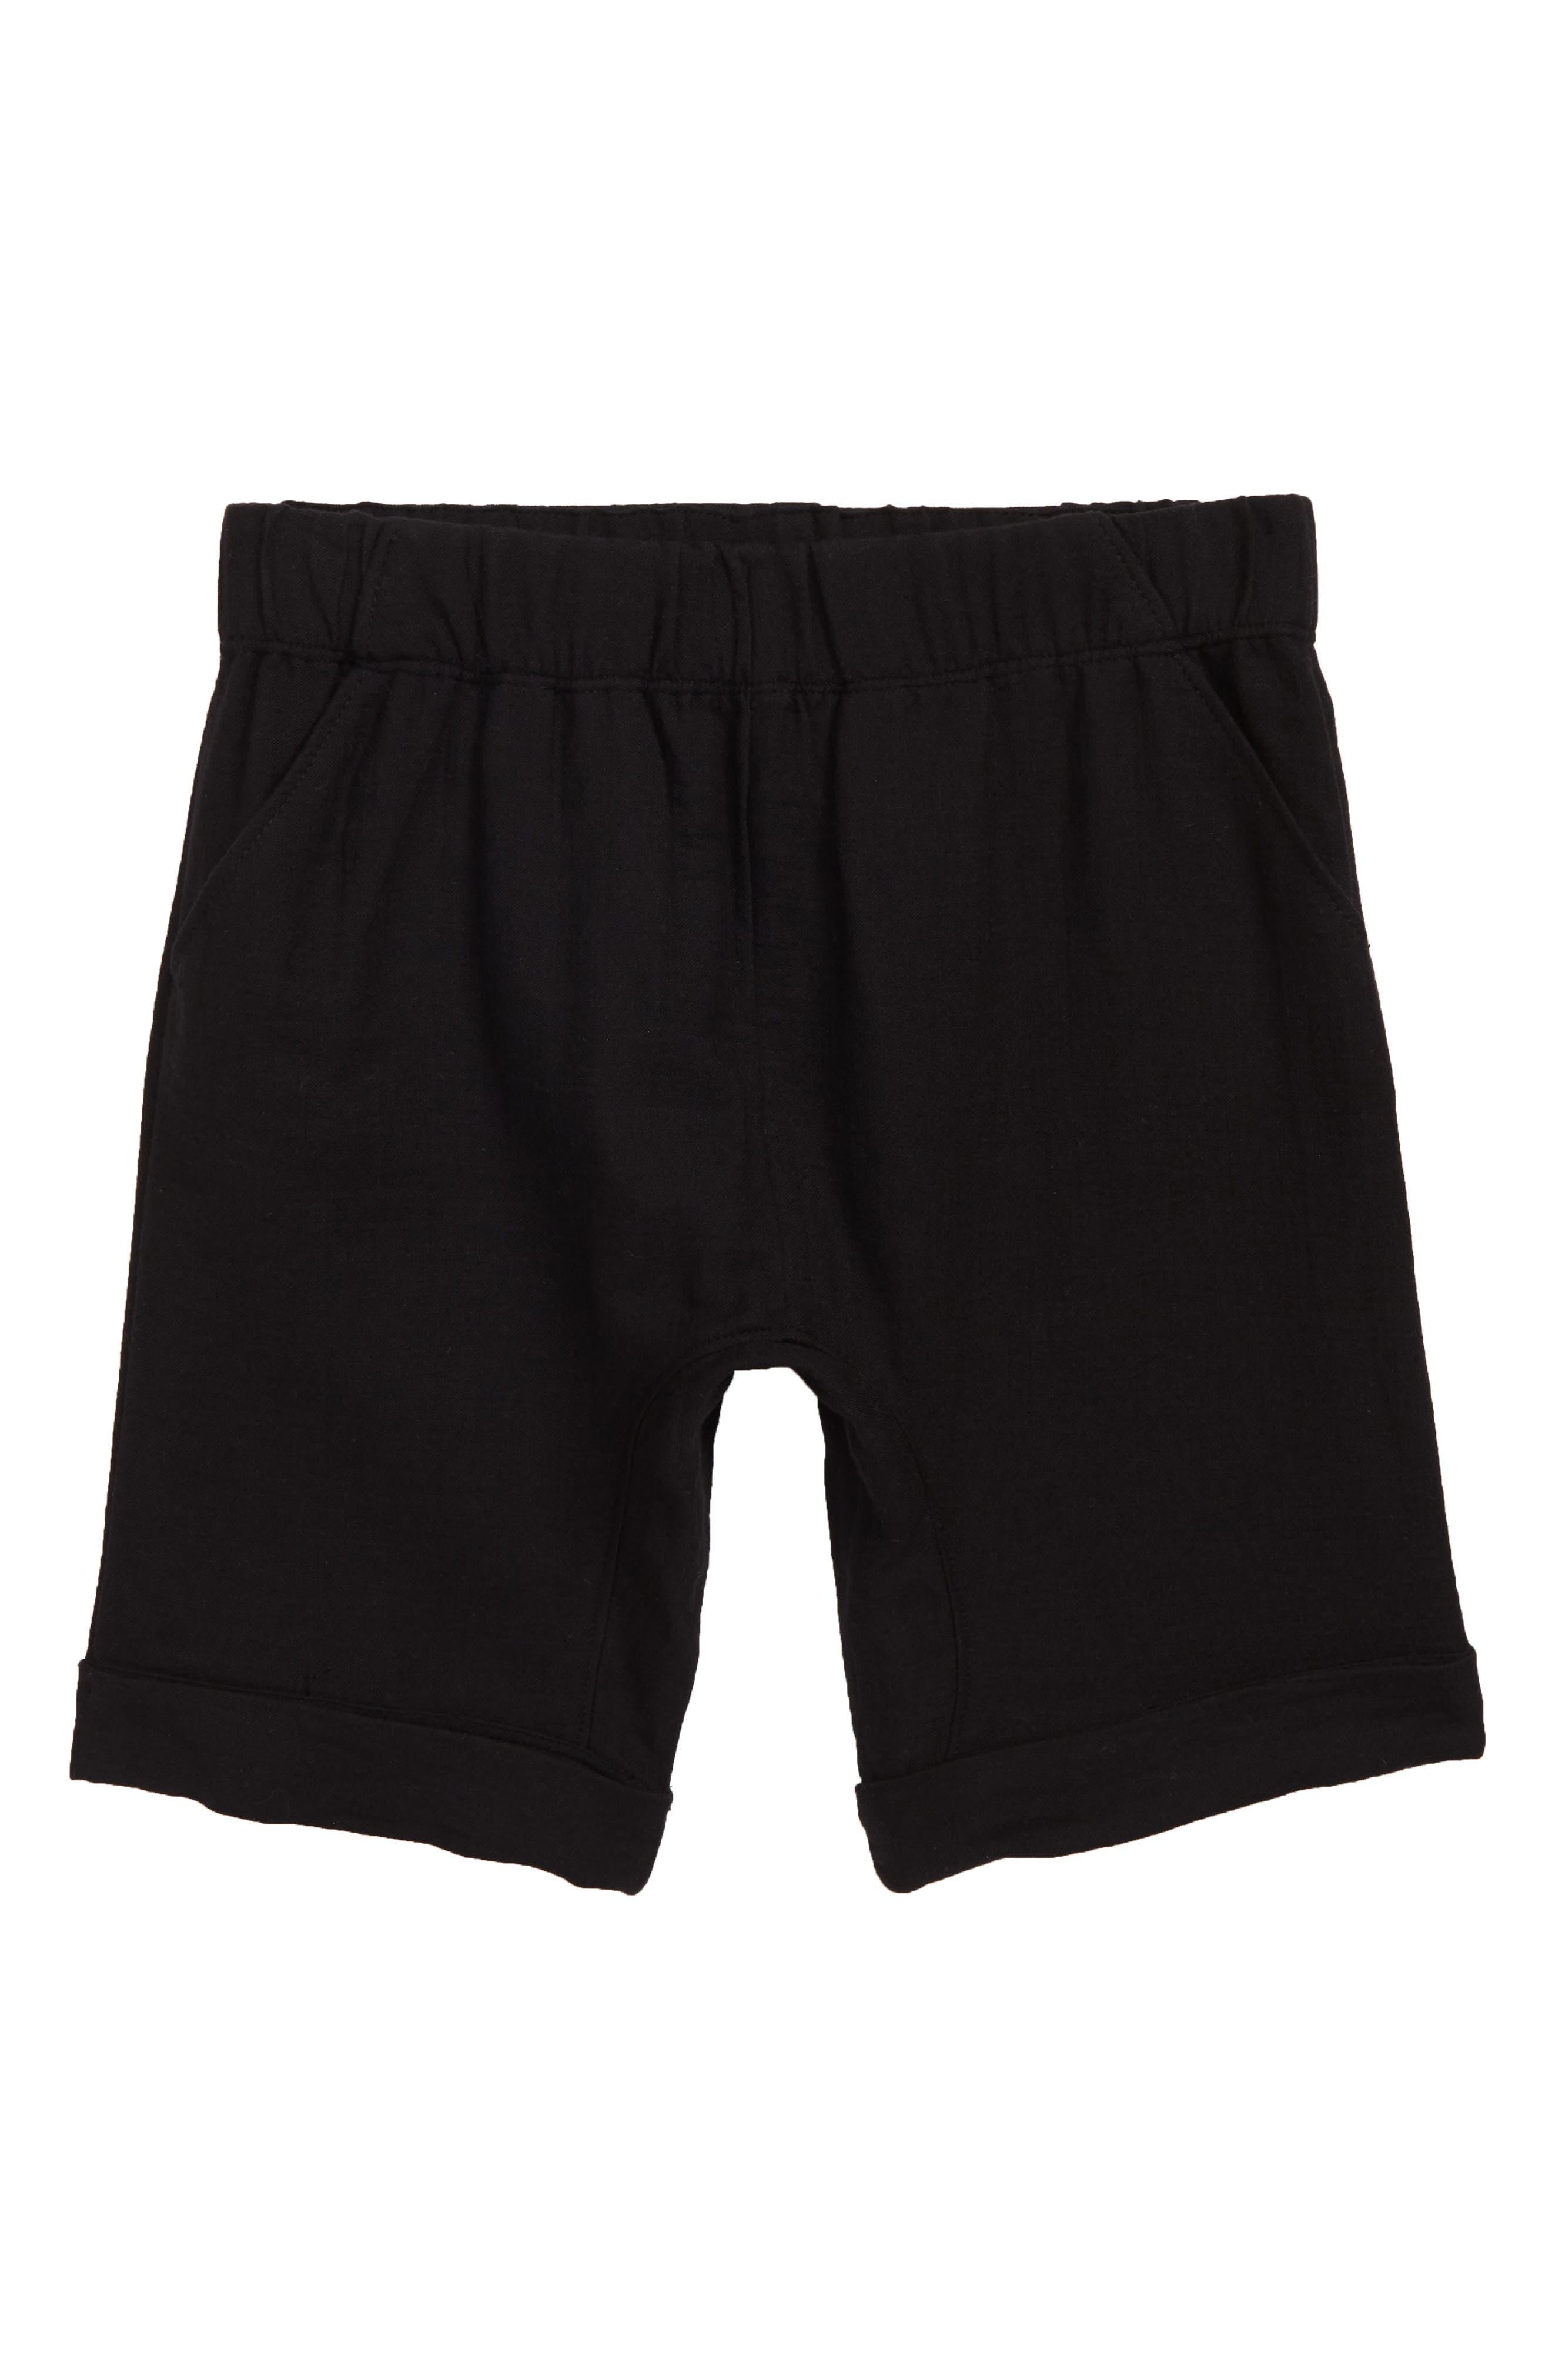 Monkey Shorts, Main, color, BLACK